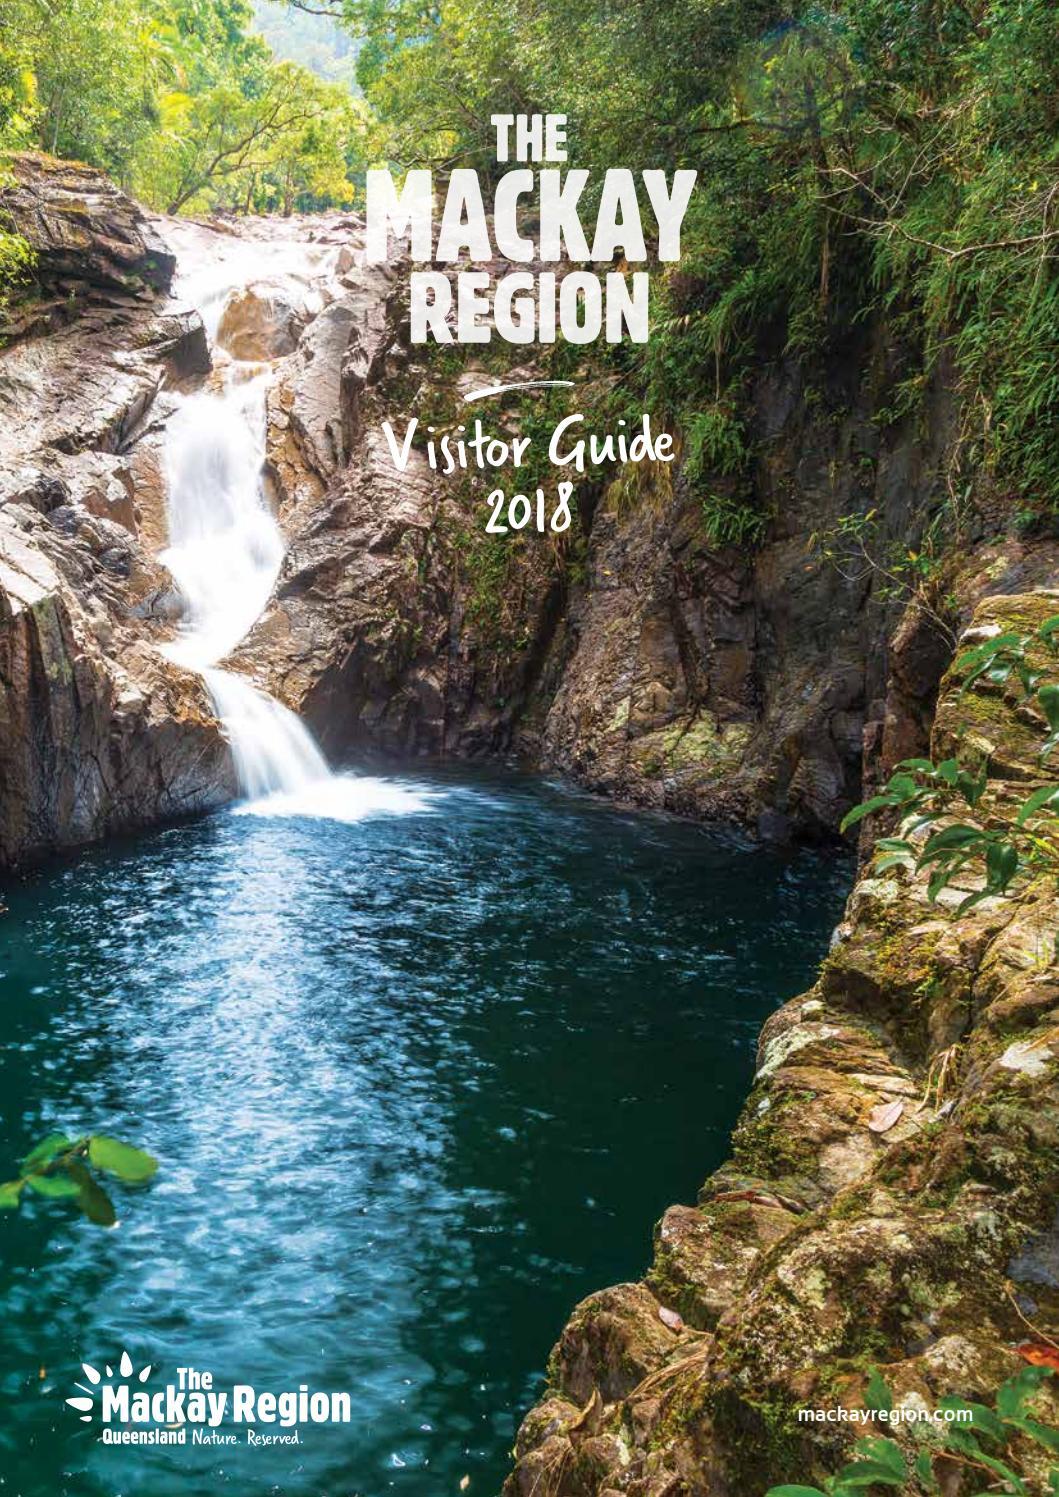 Mackay Region Visitor Guide 2018 by Vink Publishing - issuu